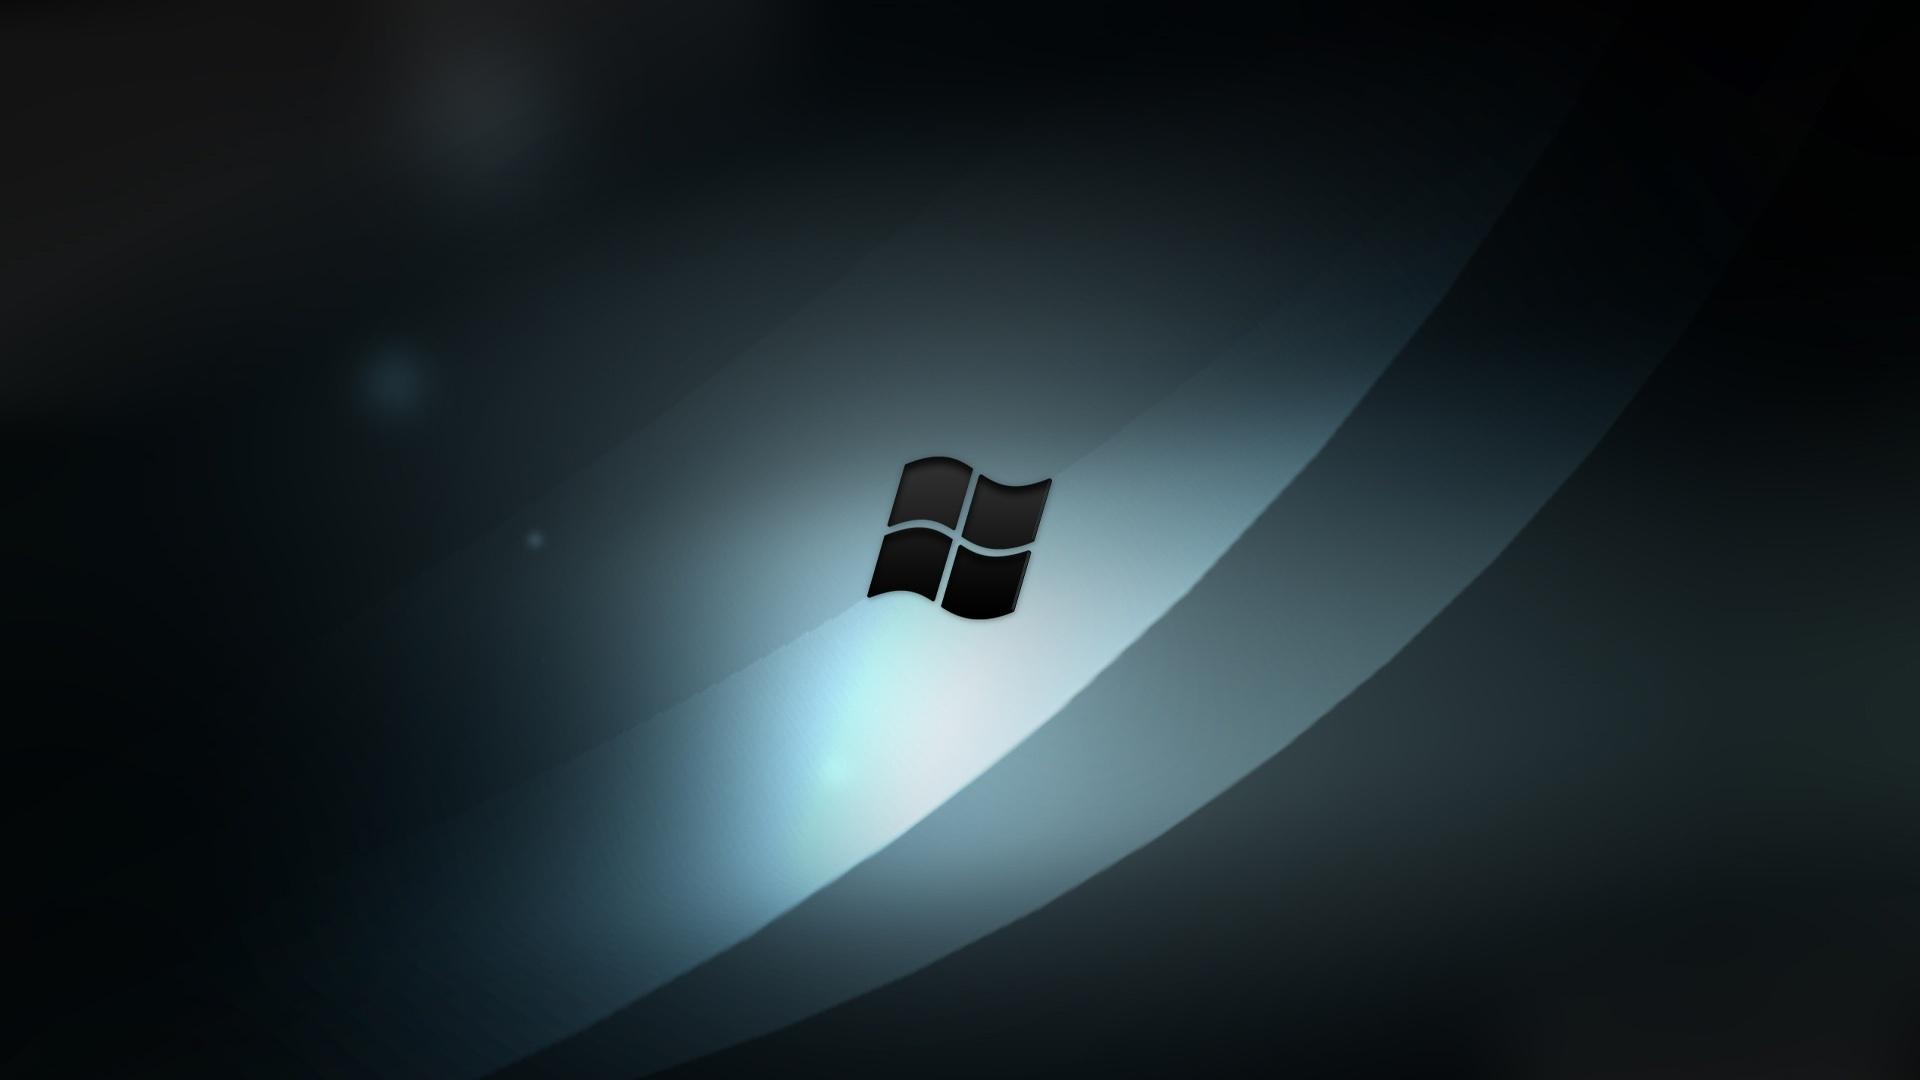 Black Windows 8 Desktop Background 6915186 1920x1080